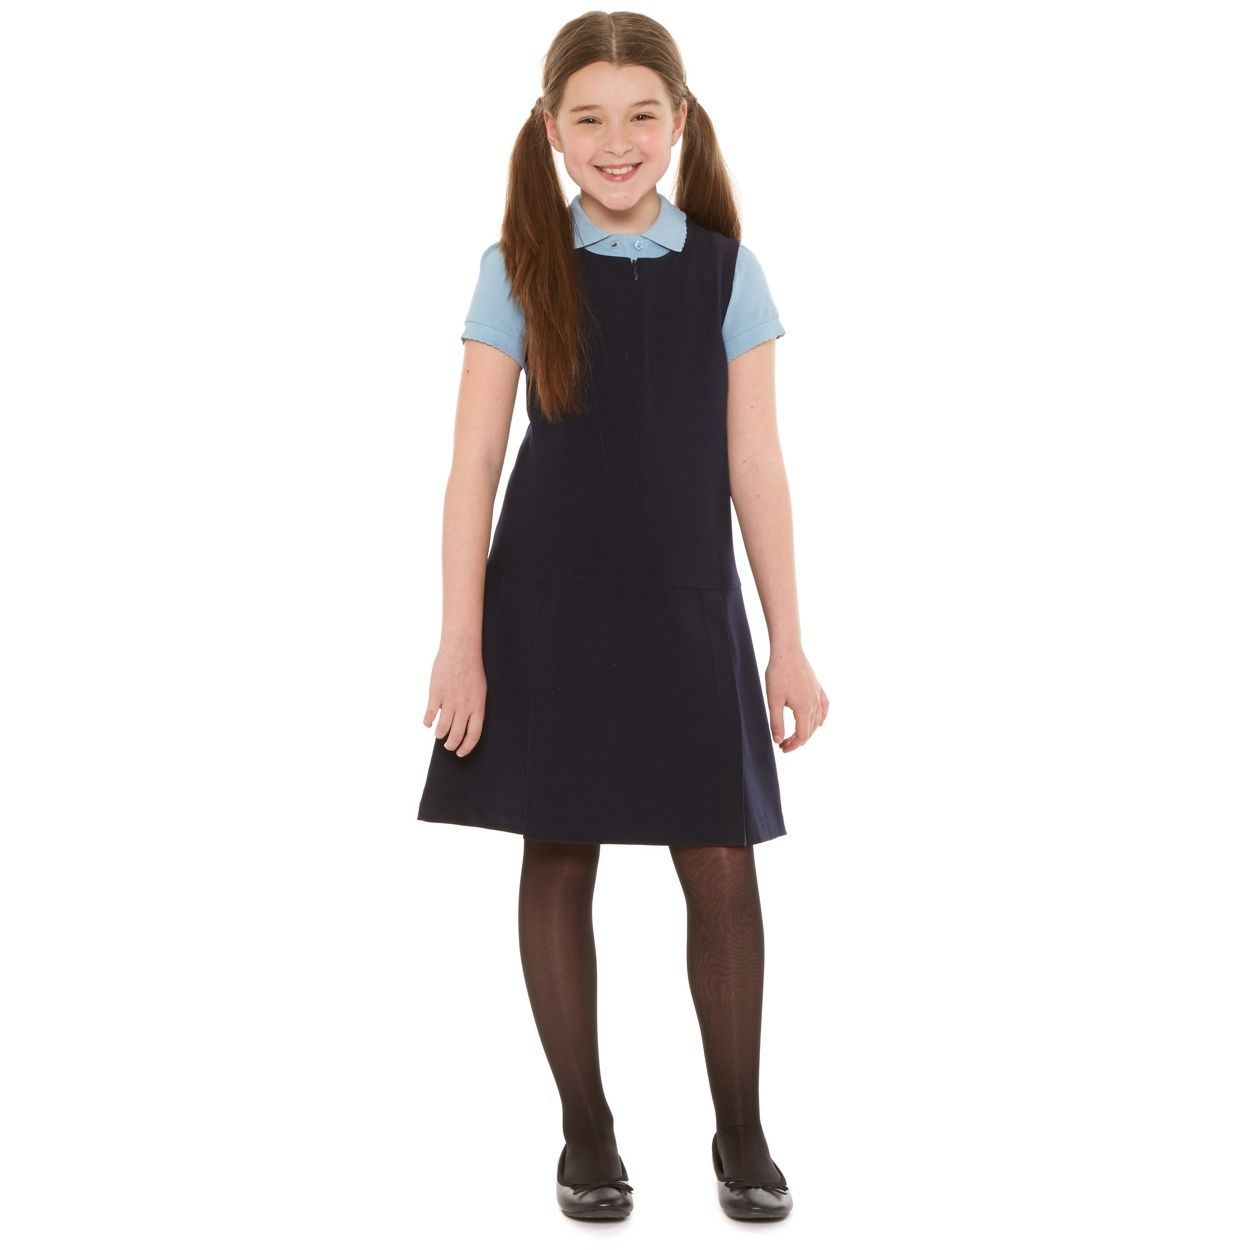 Girls Premium Quality Box Pleat Zip Front Pinafore School Uniform Dress UK Made